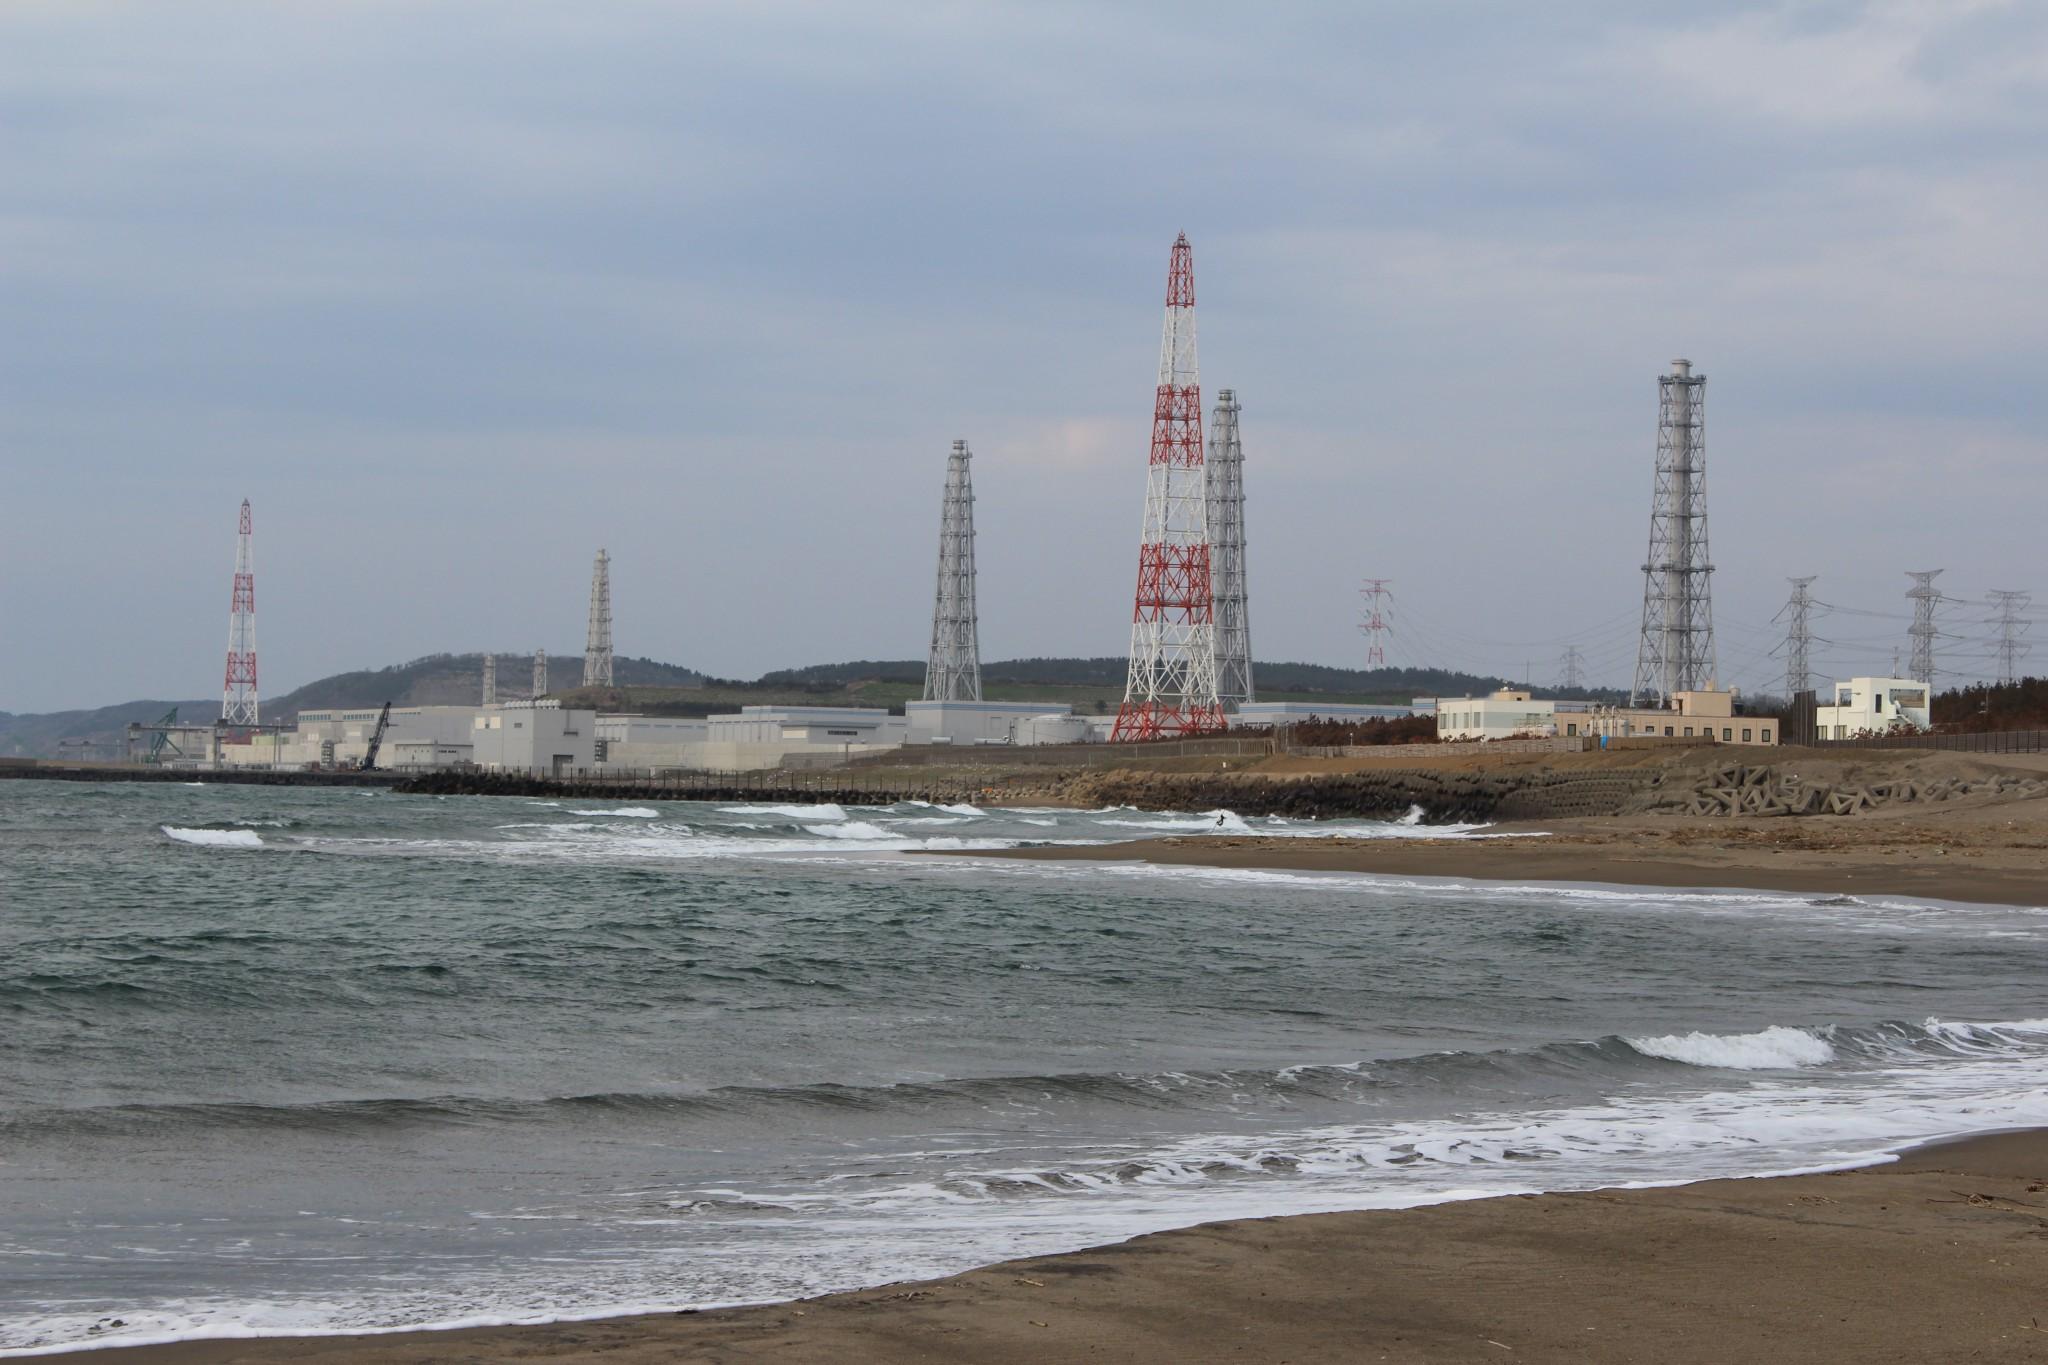 Kashiwazaki_Kariwa_Ncentrale_nucléaire_Japon